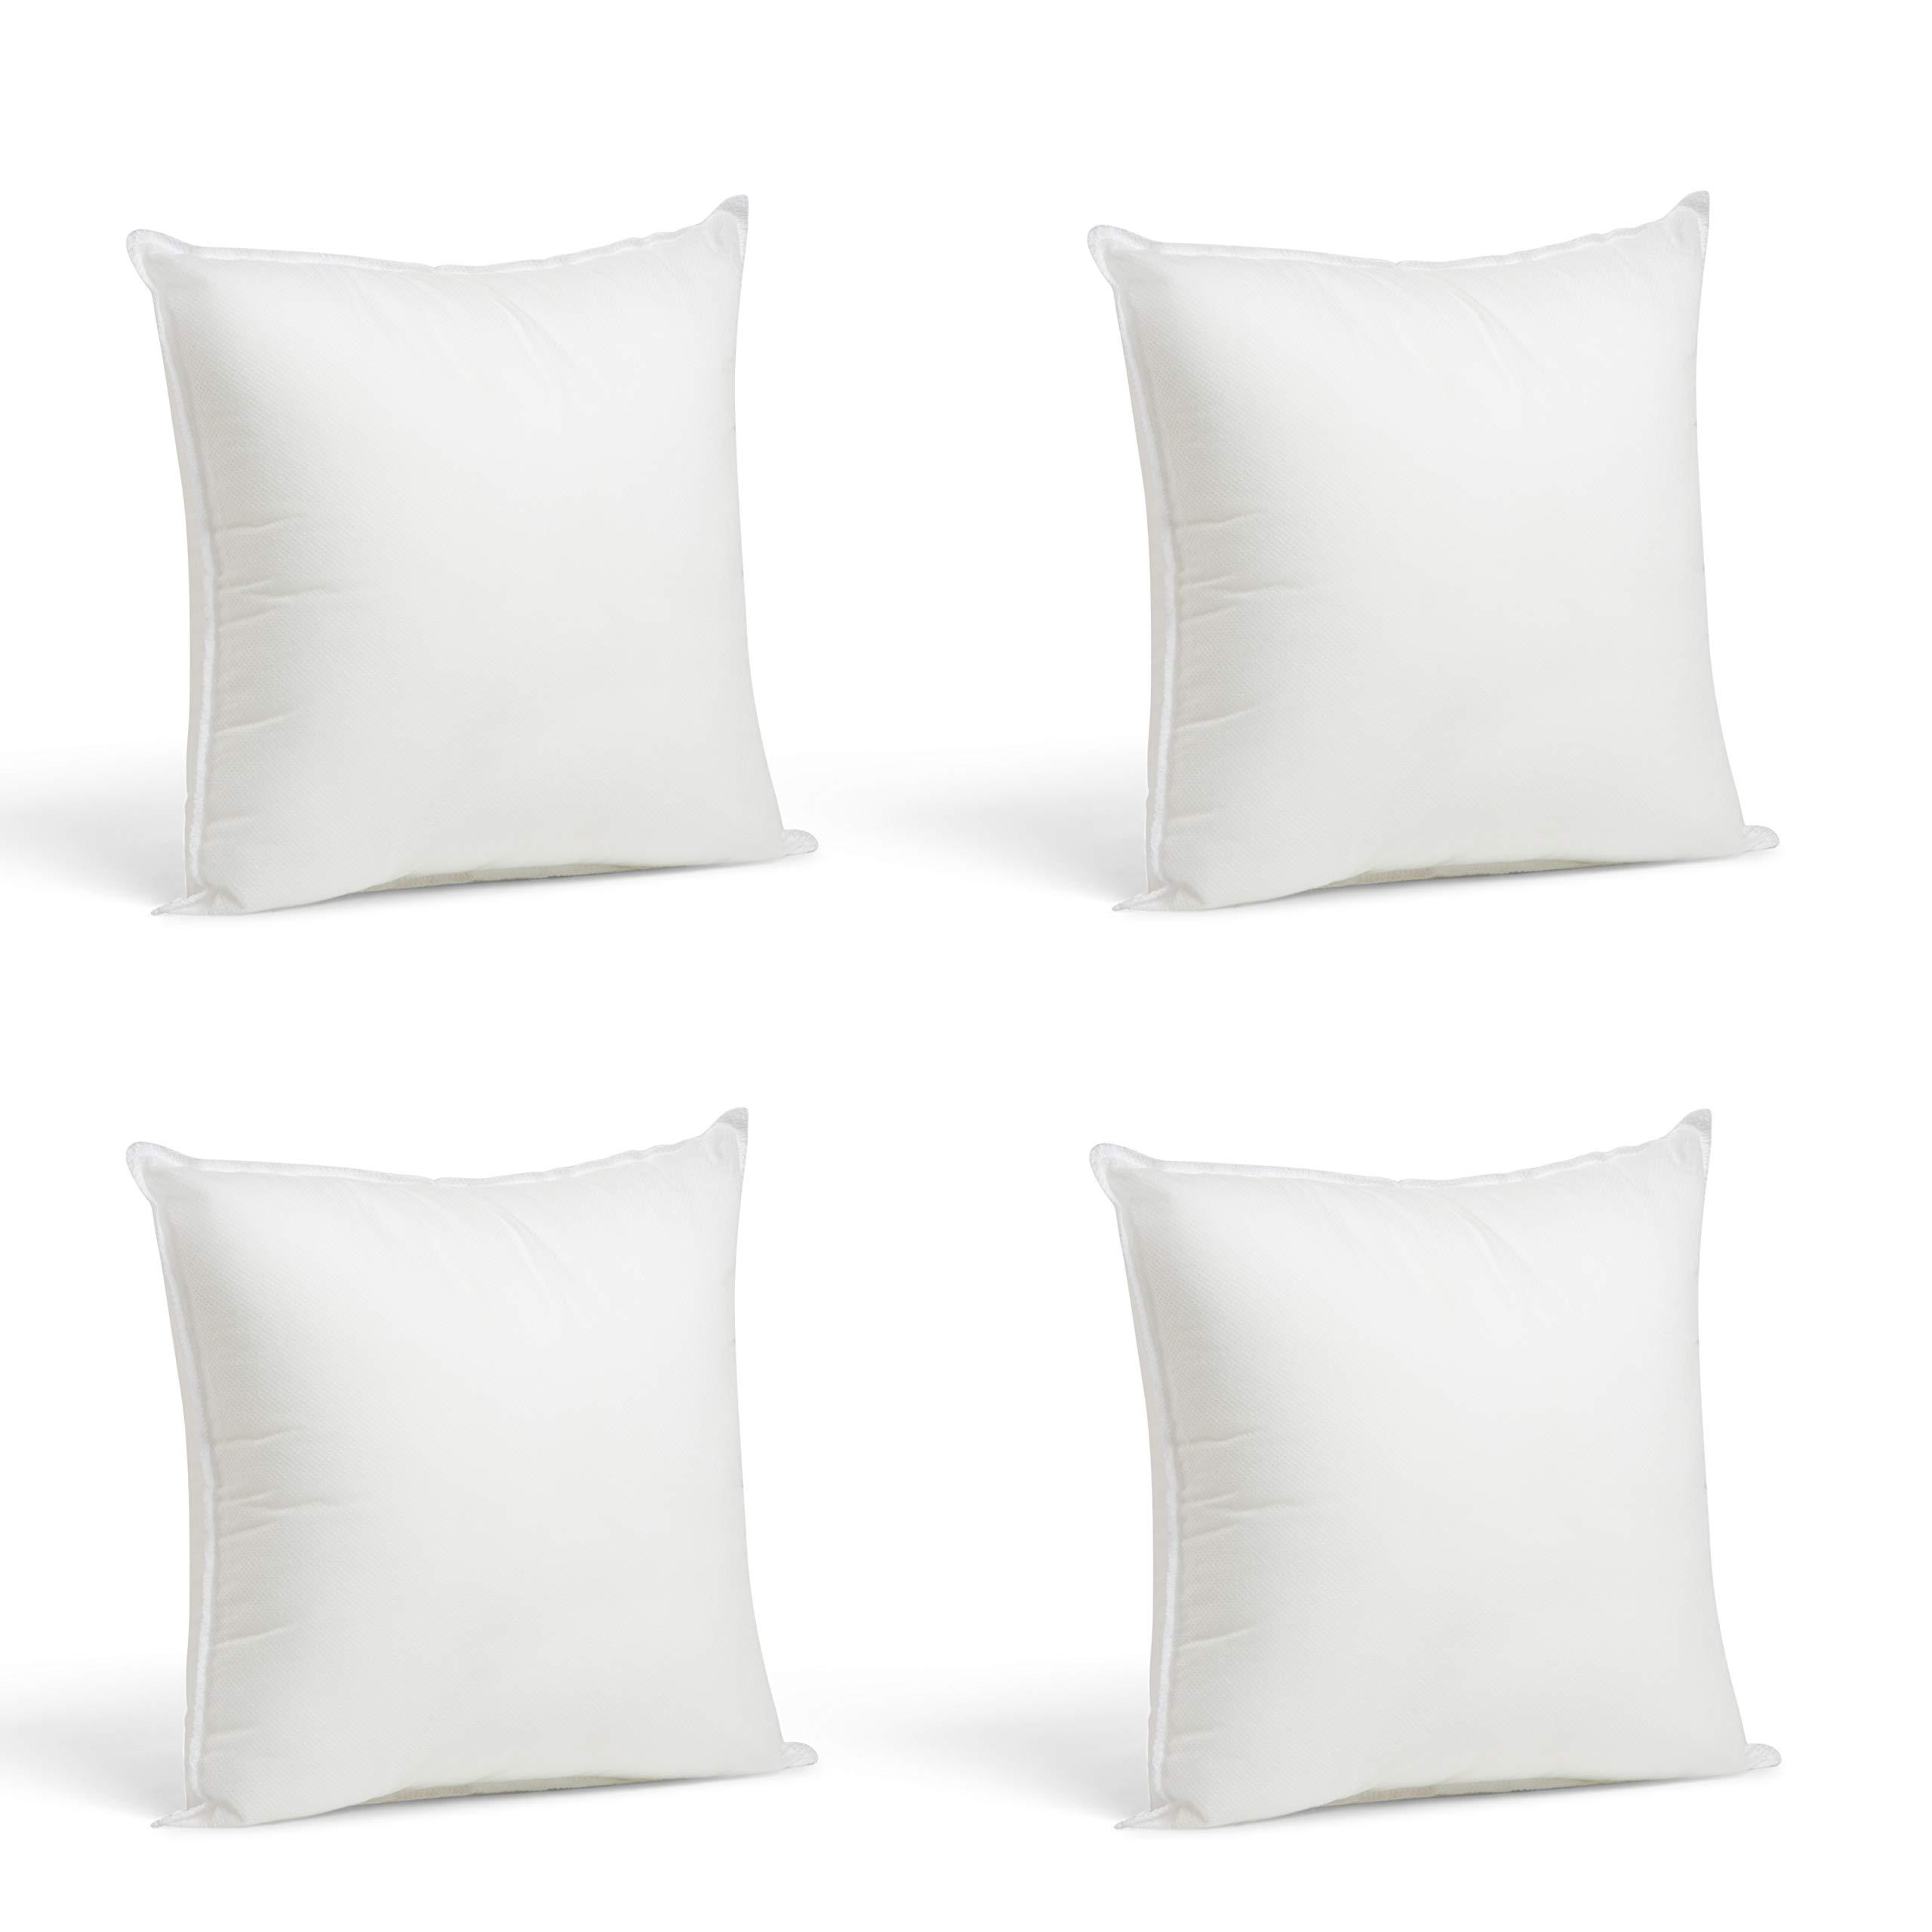 Foamily Set of 4-12 x 12 Premium Hypoallergenic Stuffer Pillow Inserts Sham Square Form Polyester, 12 L X 12 W, Standard/White